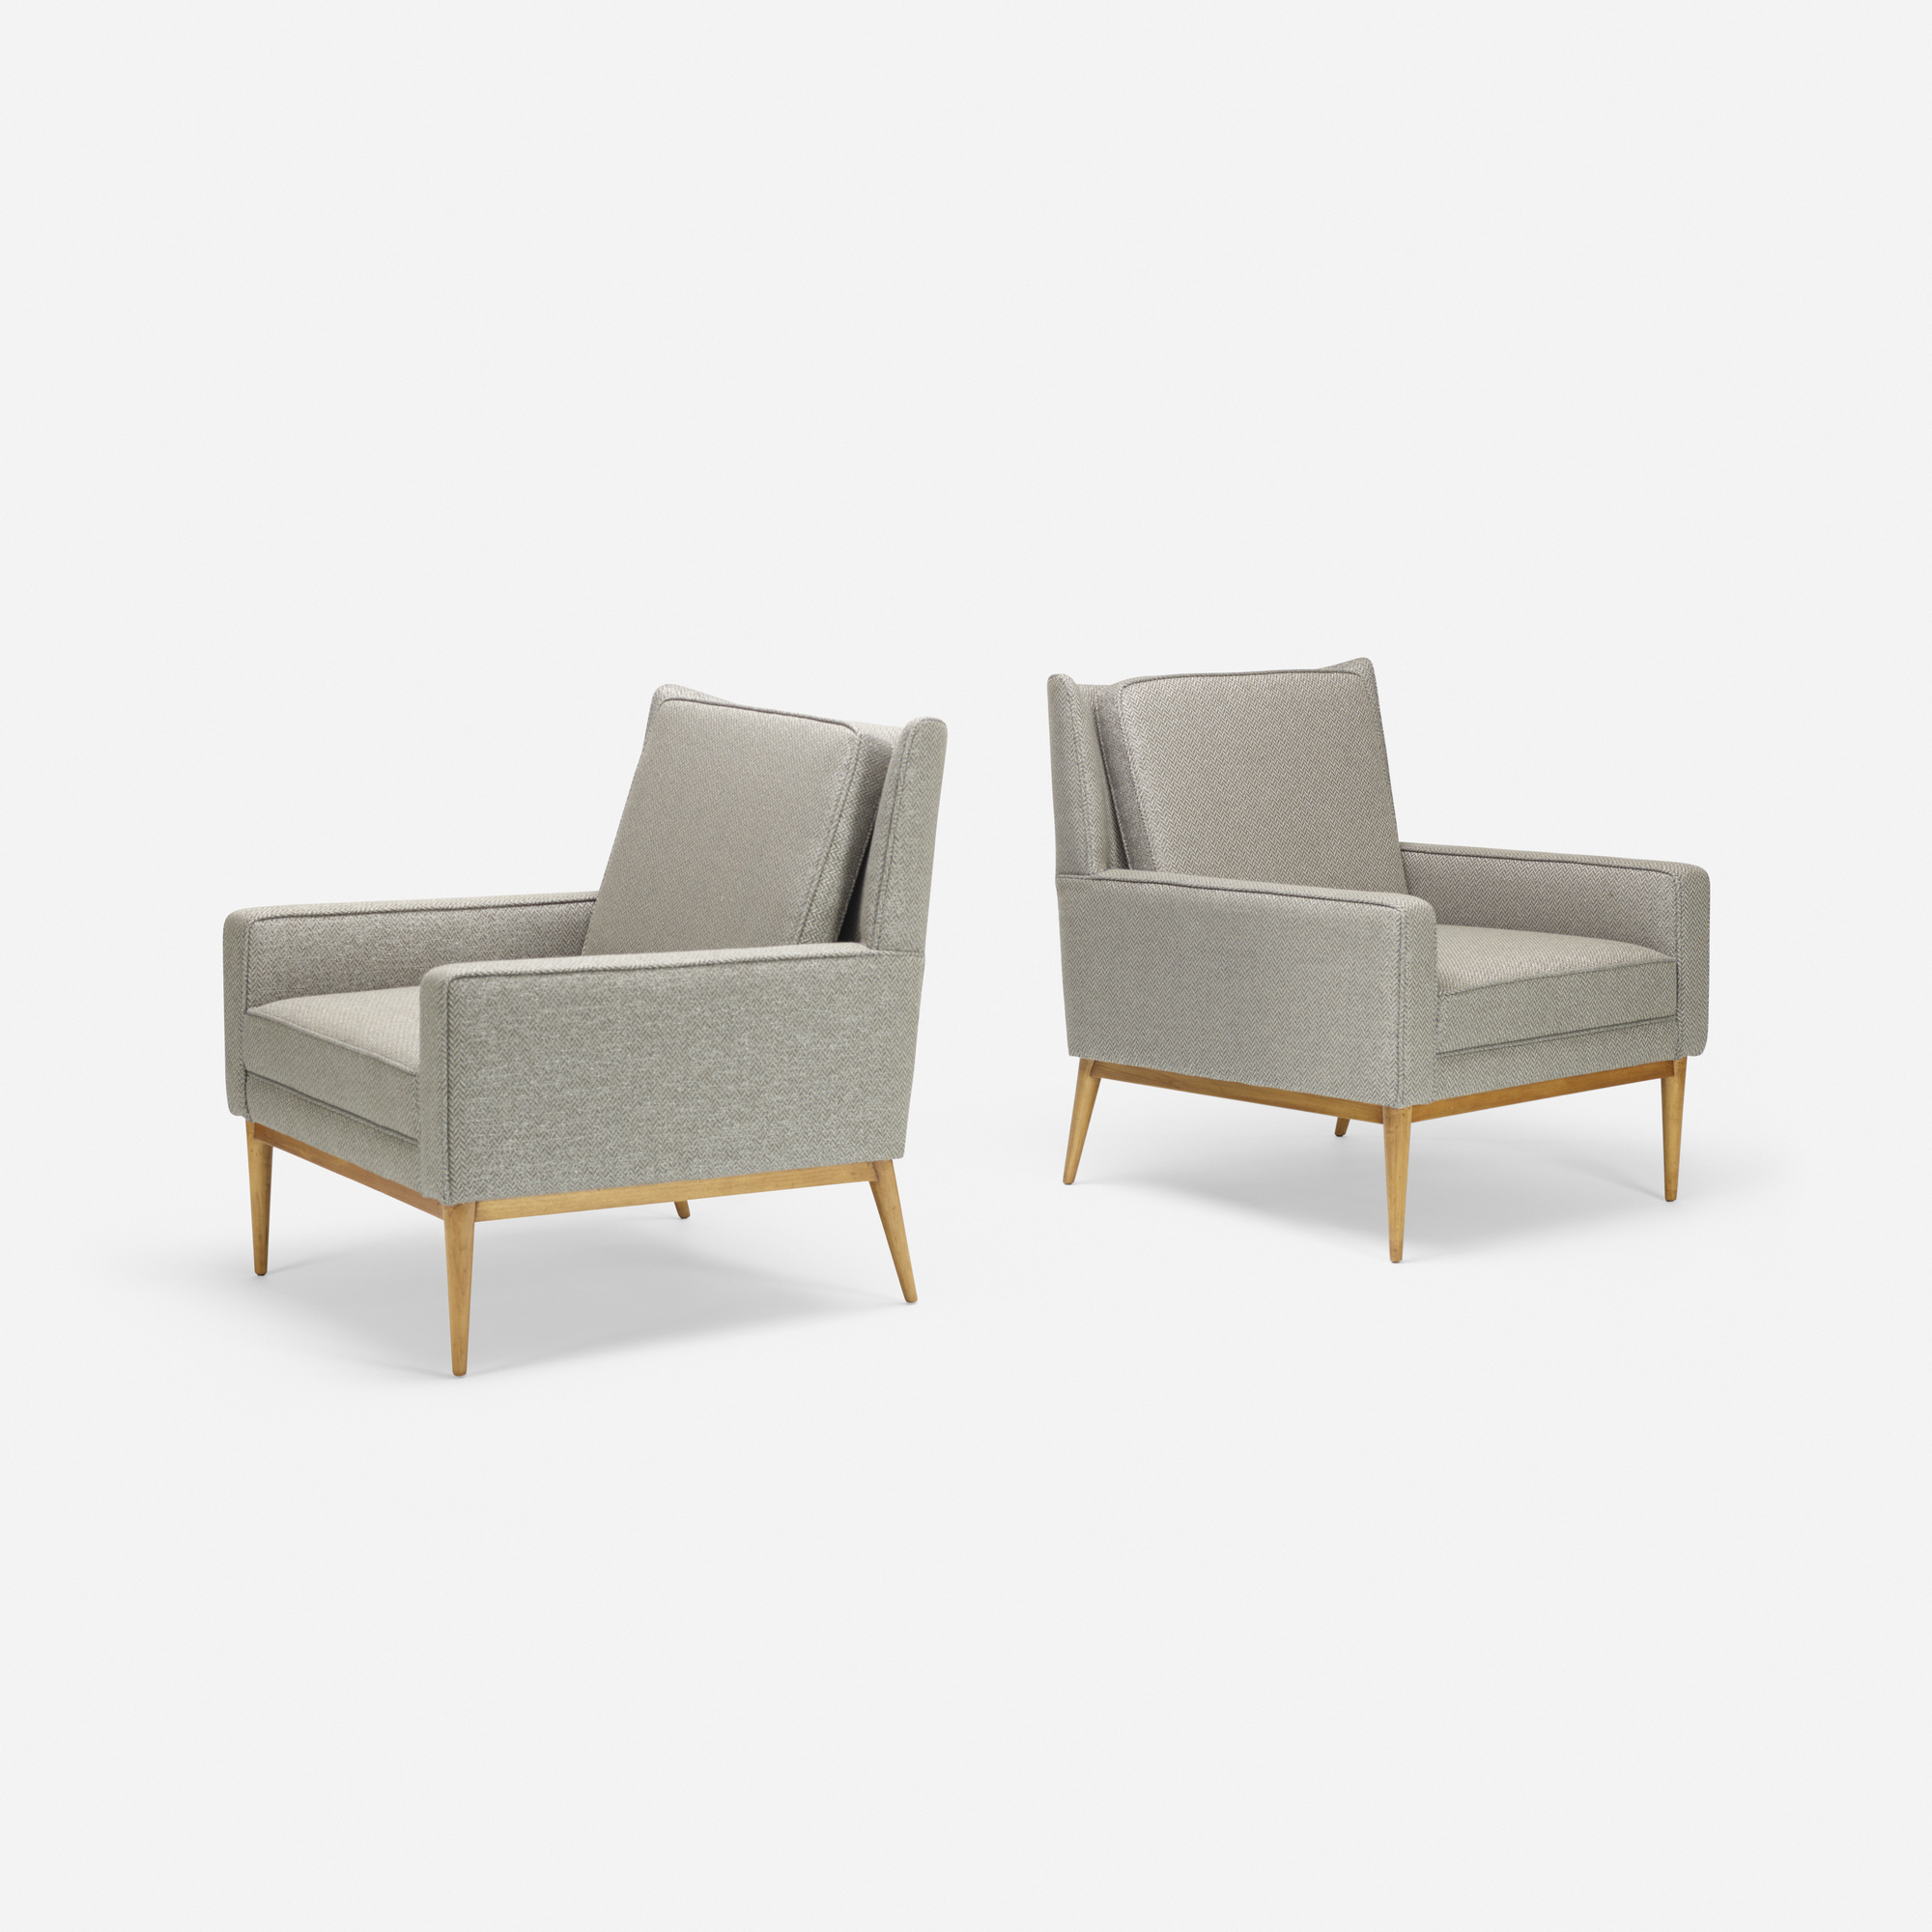 348: Paul McCobb / lounge chairs model 302, pair (1 of 3)